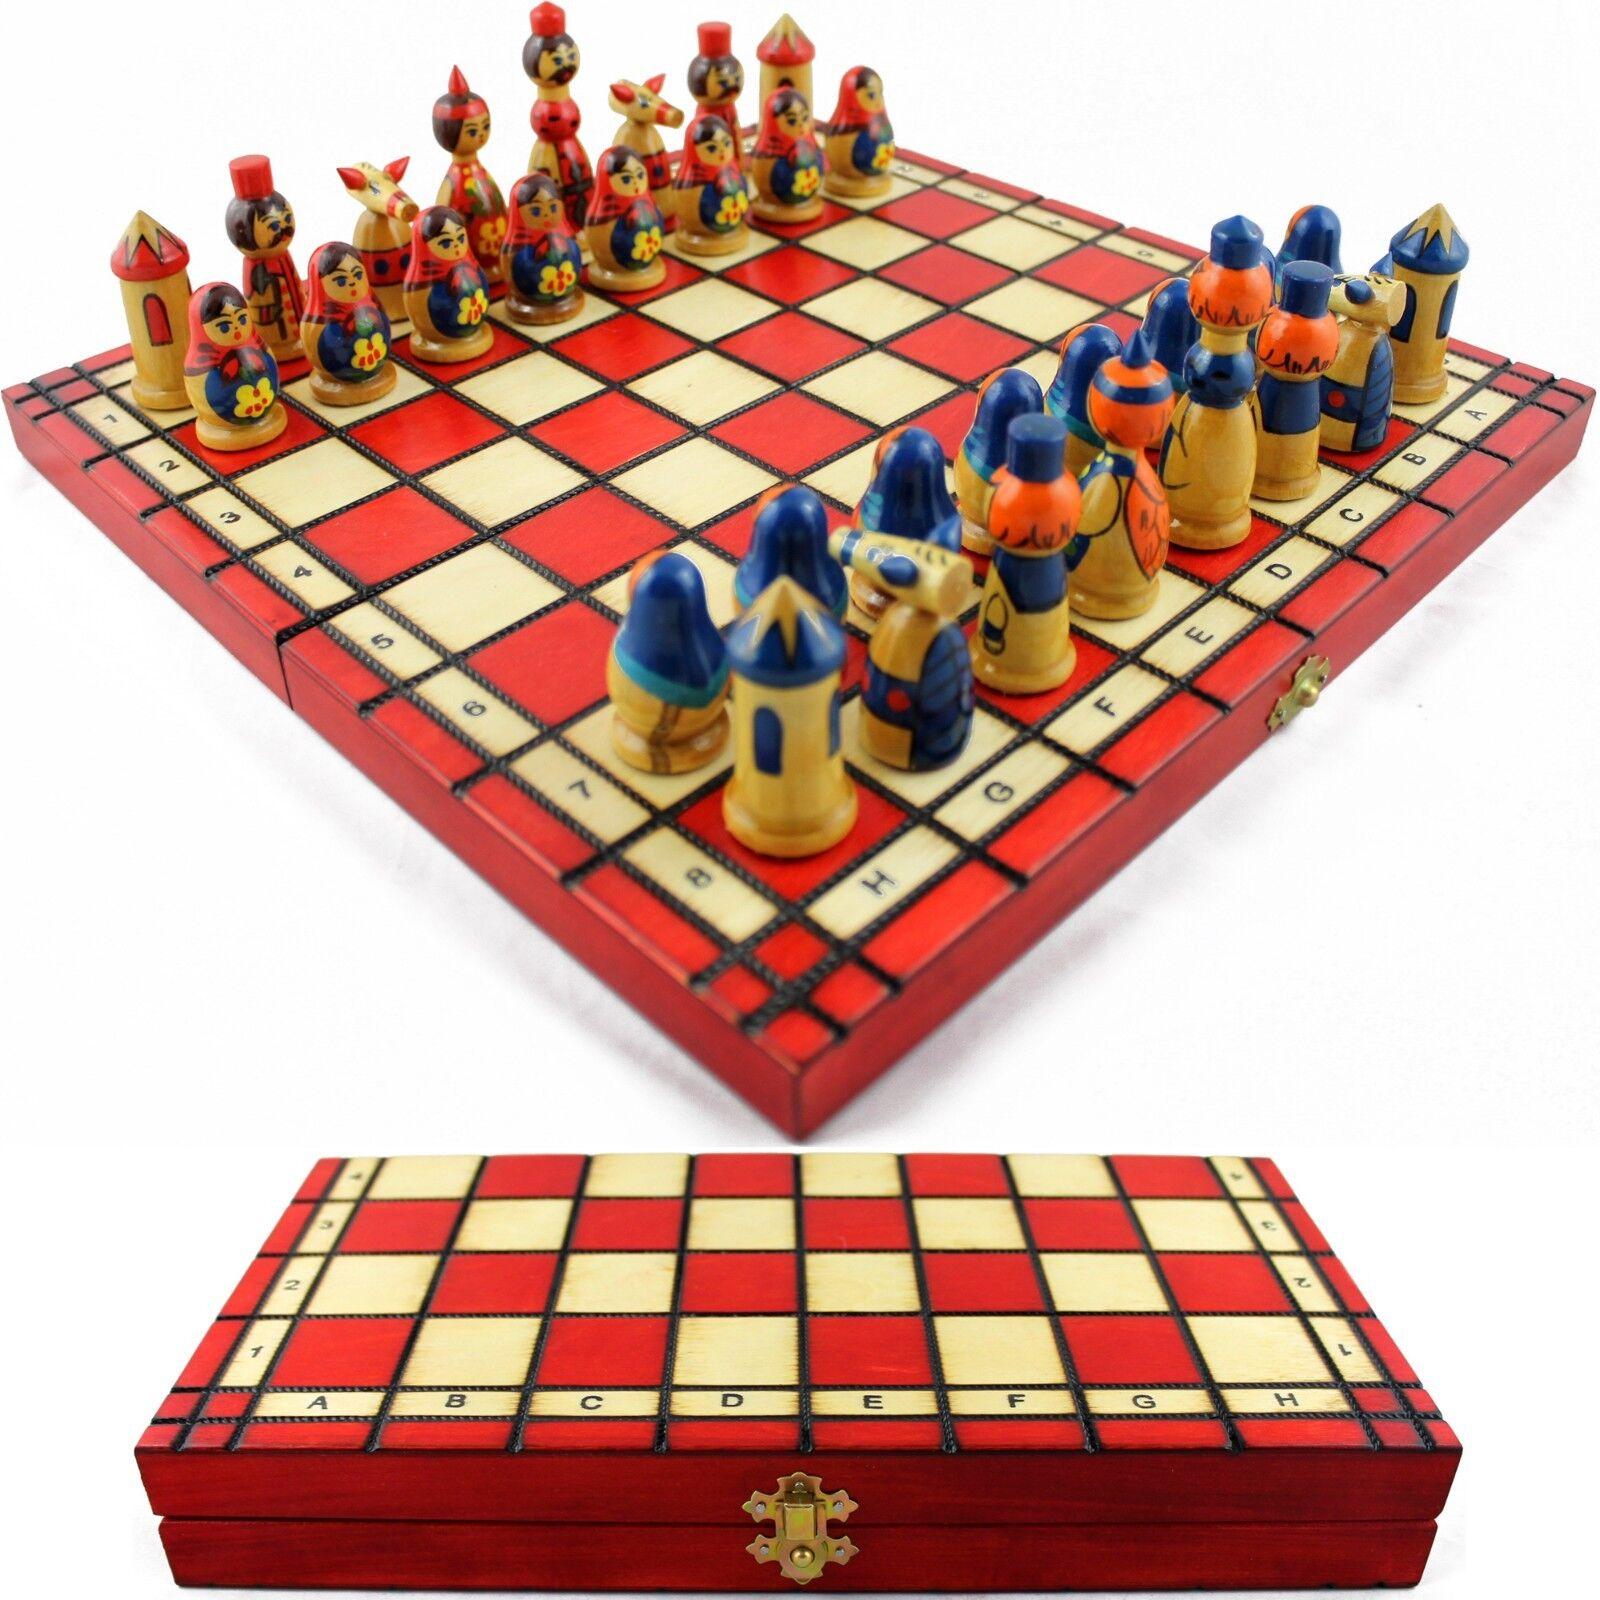 Chess Board Game - Matryoshkas Russian Chess Pieces